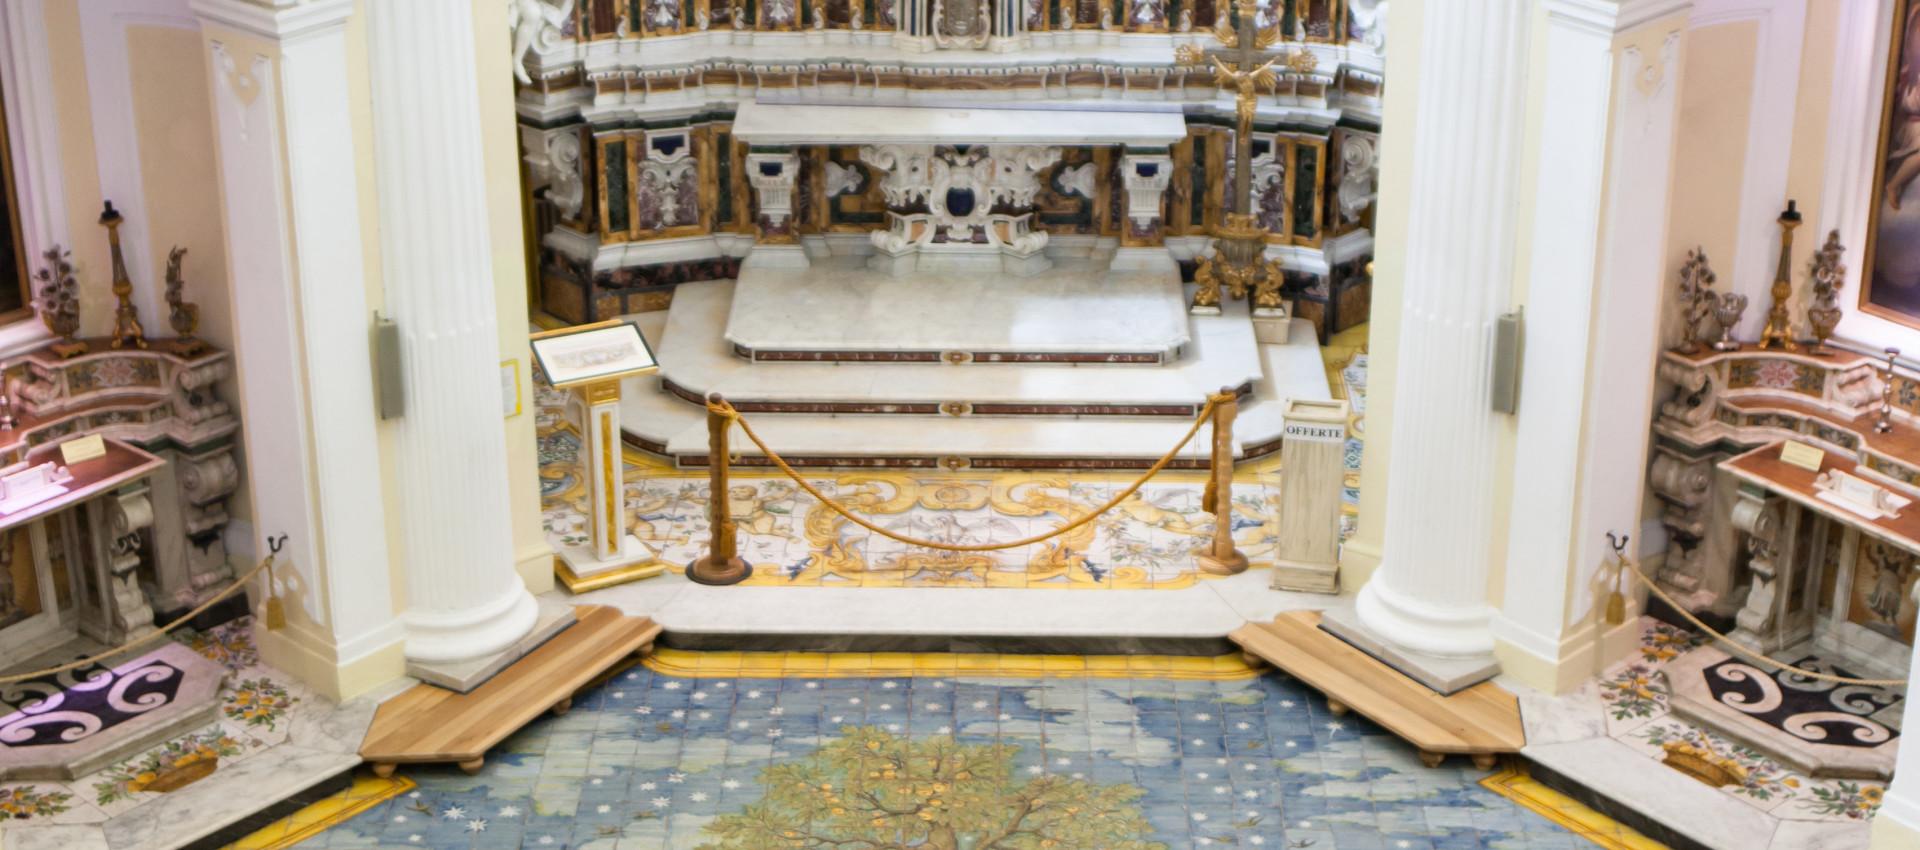 Ceramic floor of San Michele (Saint Michael) church, Anacapri